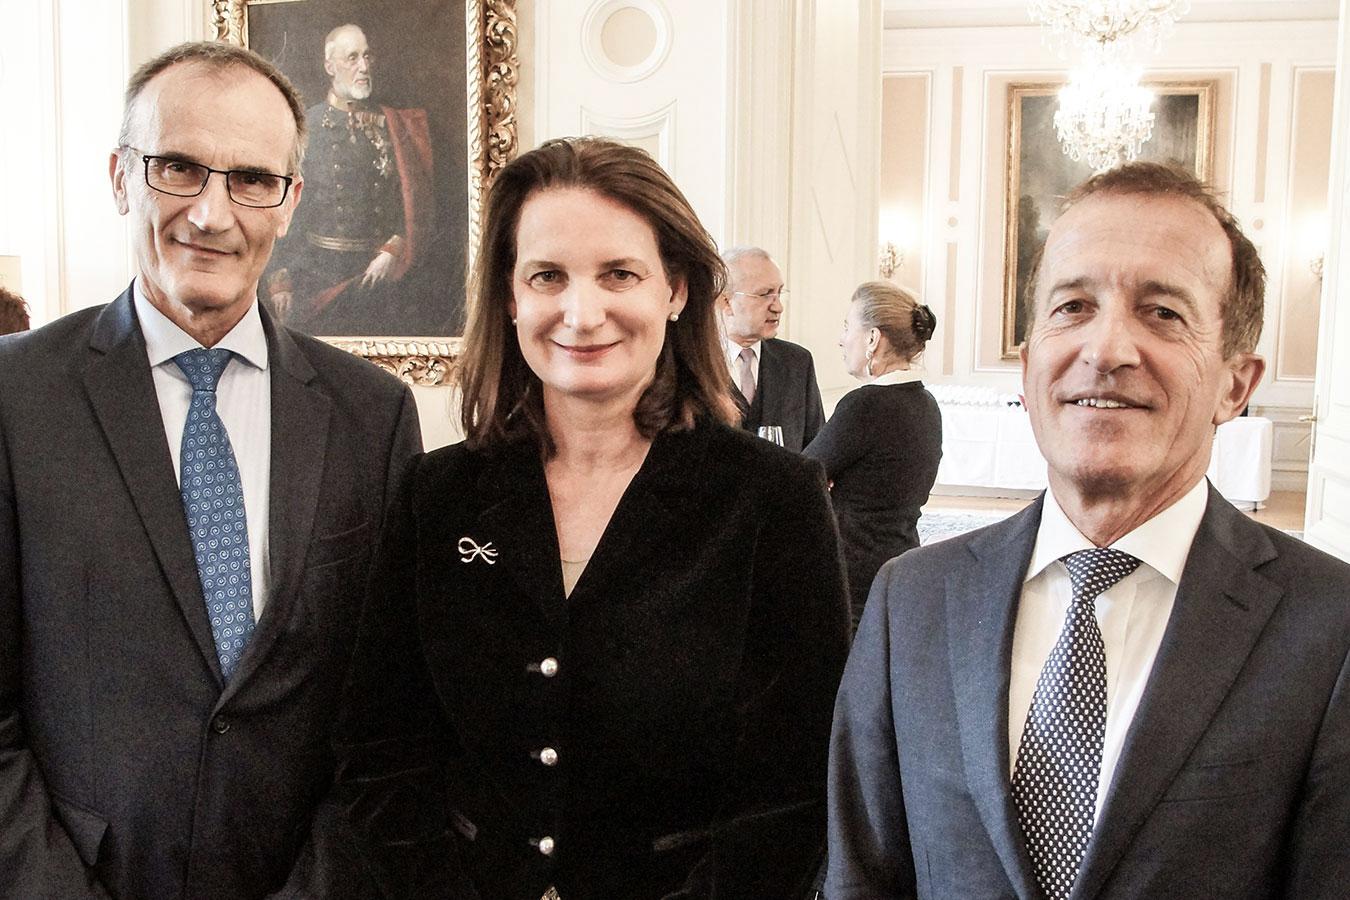 ch-peter-burkhard-2018-austrian-national-day-ambassador-wenzel-ellison-parker.jpg